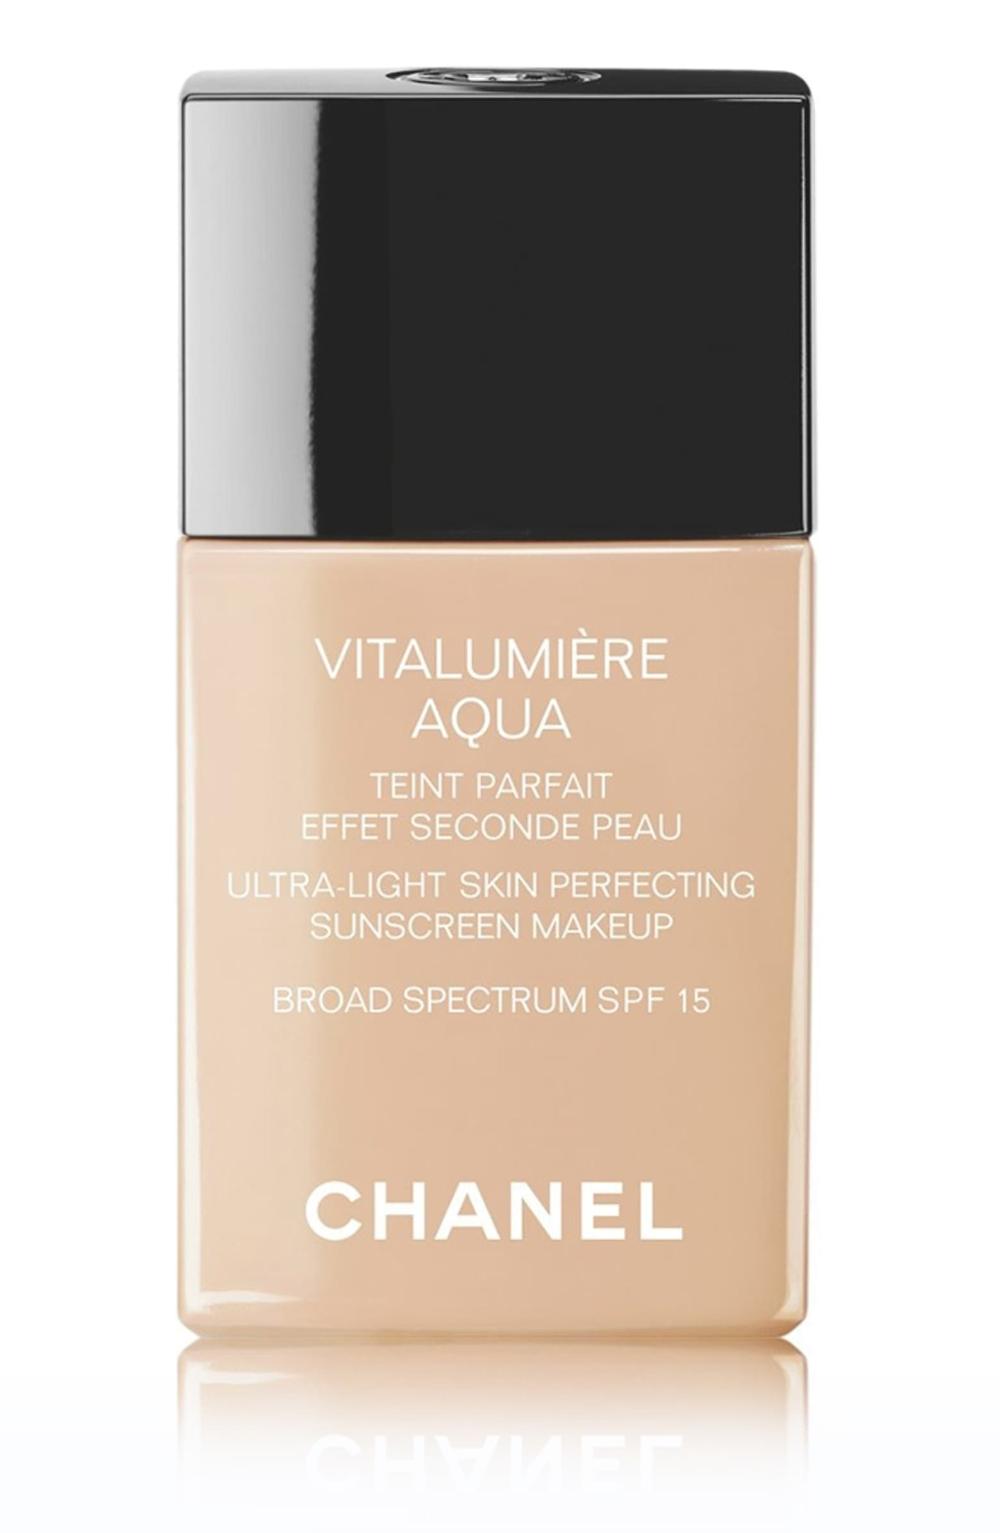 CHANEL VITALUMIÈRE AQUA UltraLight Skin Perfecting